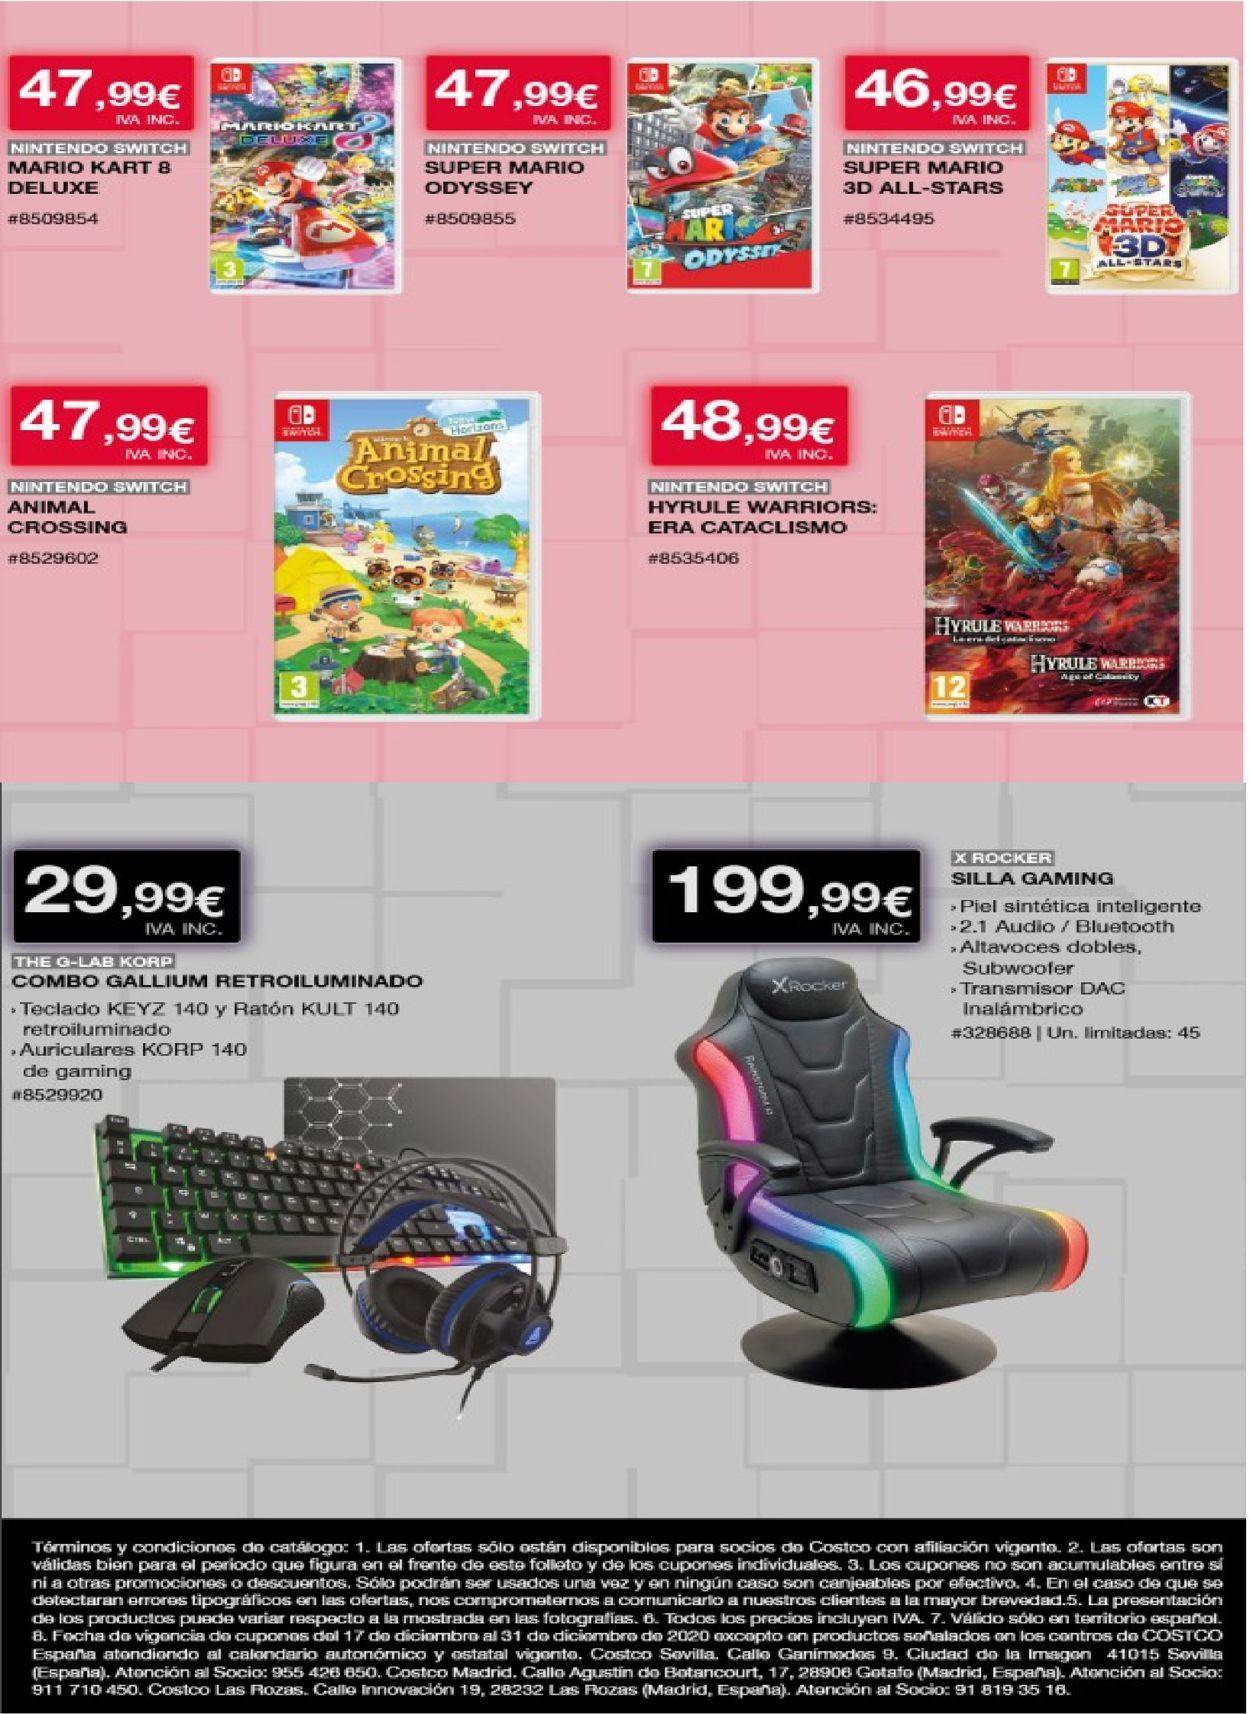 Costco Pro Game 2020 Folleto - 17.12-31.12.2020 (Página 4)